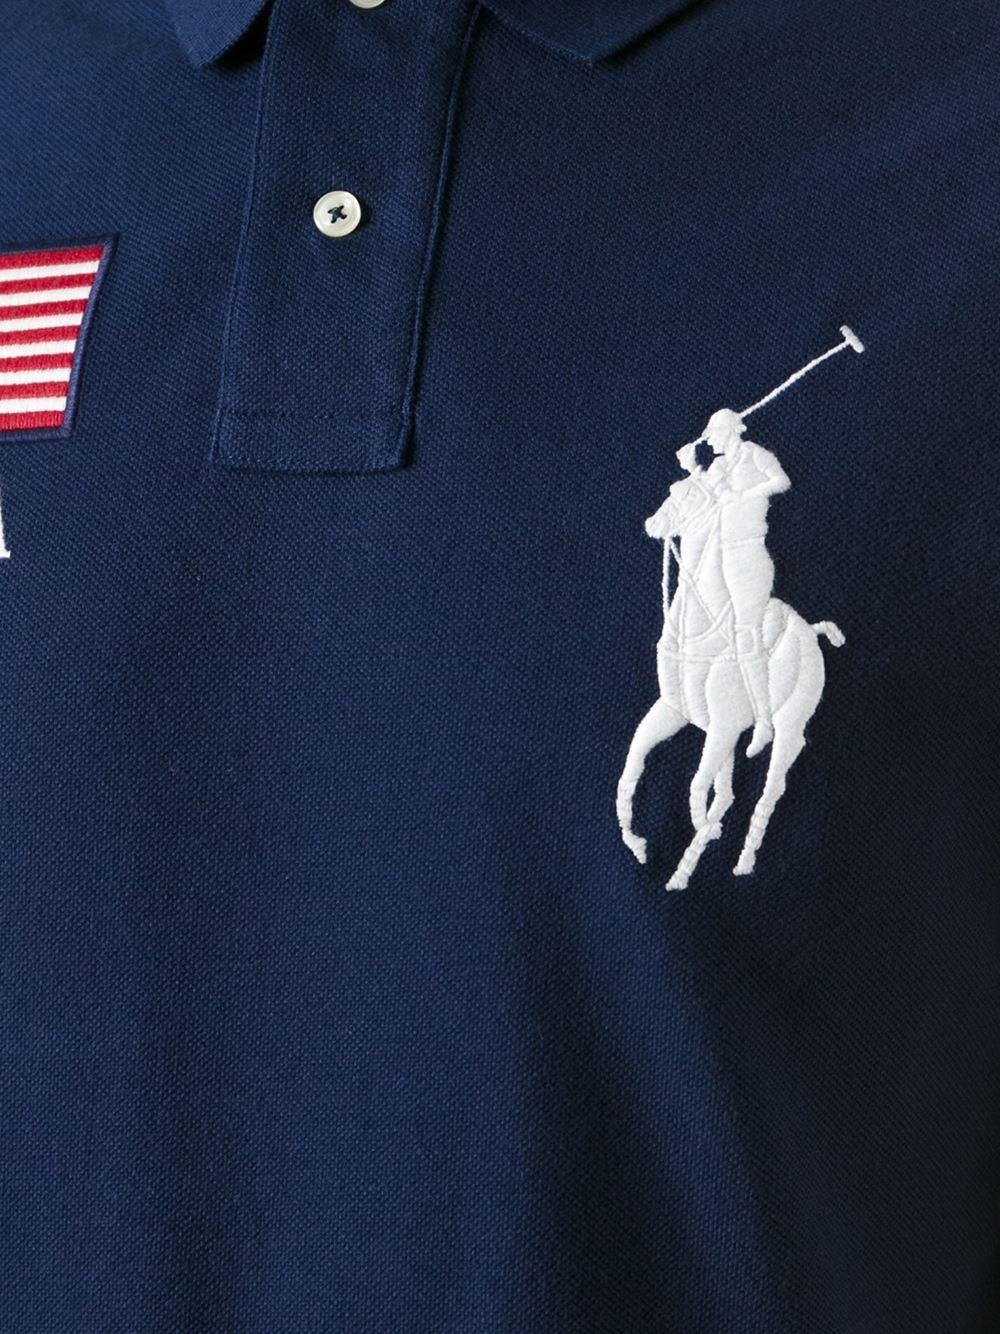 cheap for discount ff96b b1cc2 Logo Embroidery Polo Shirts - DREAMWORKS